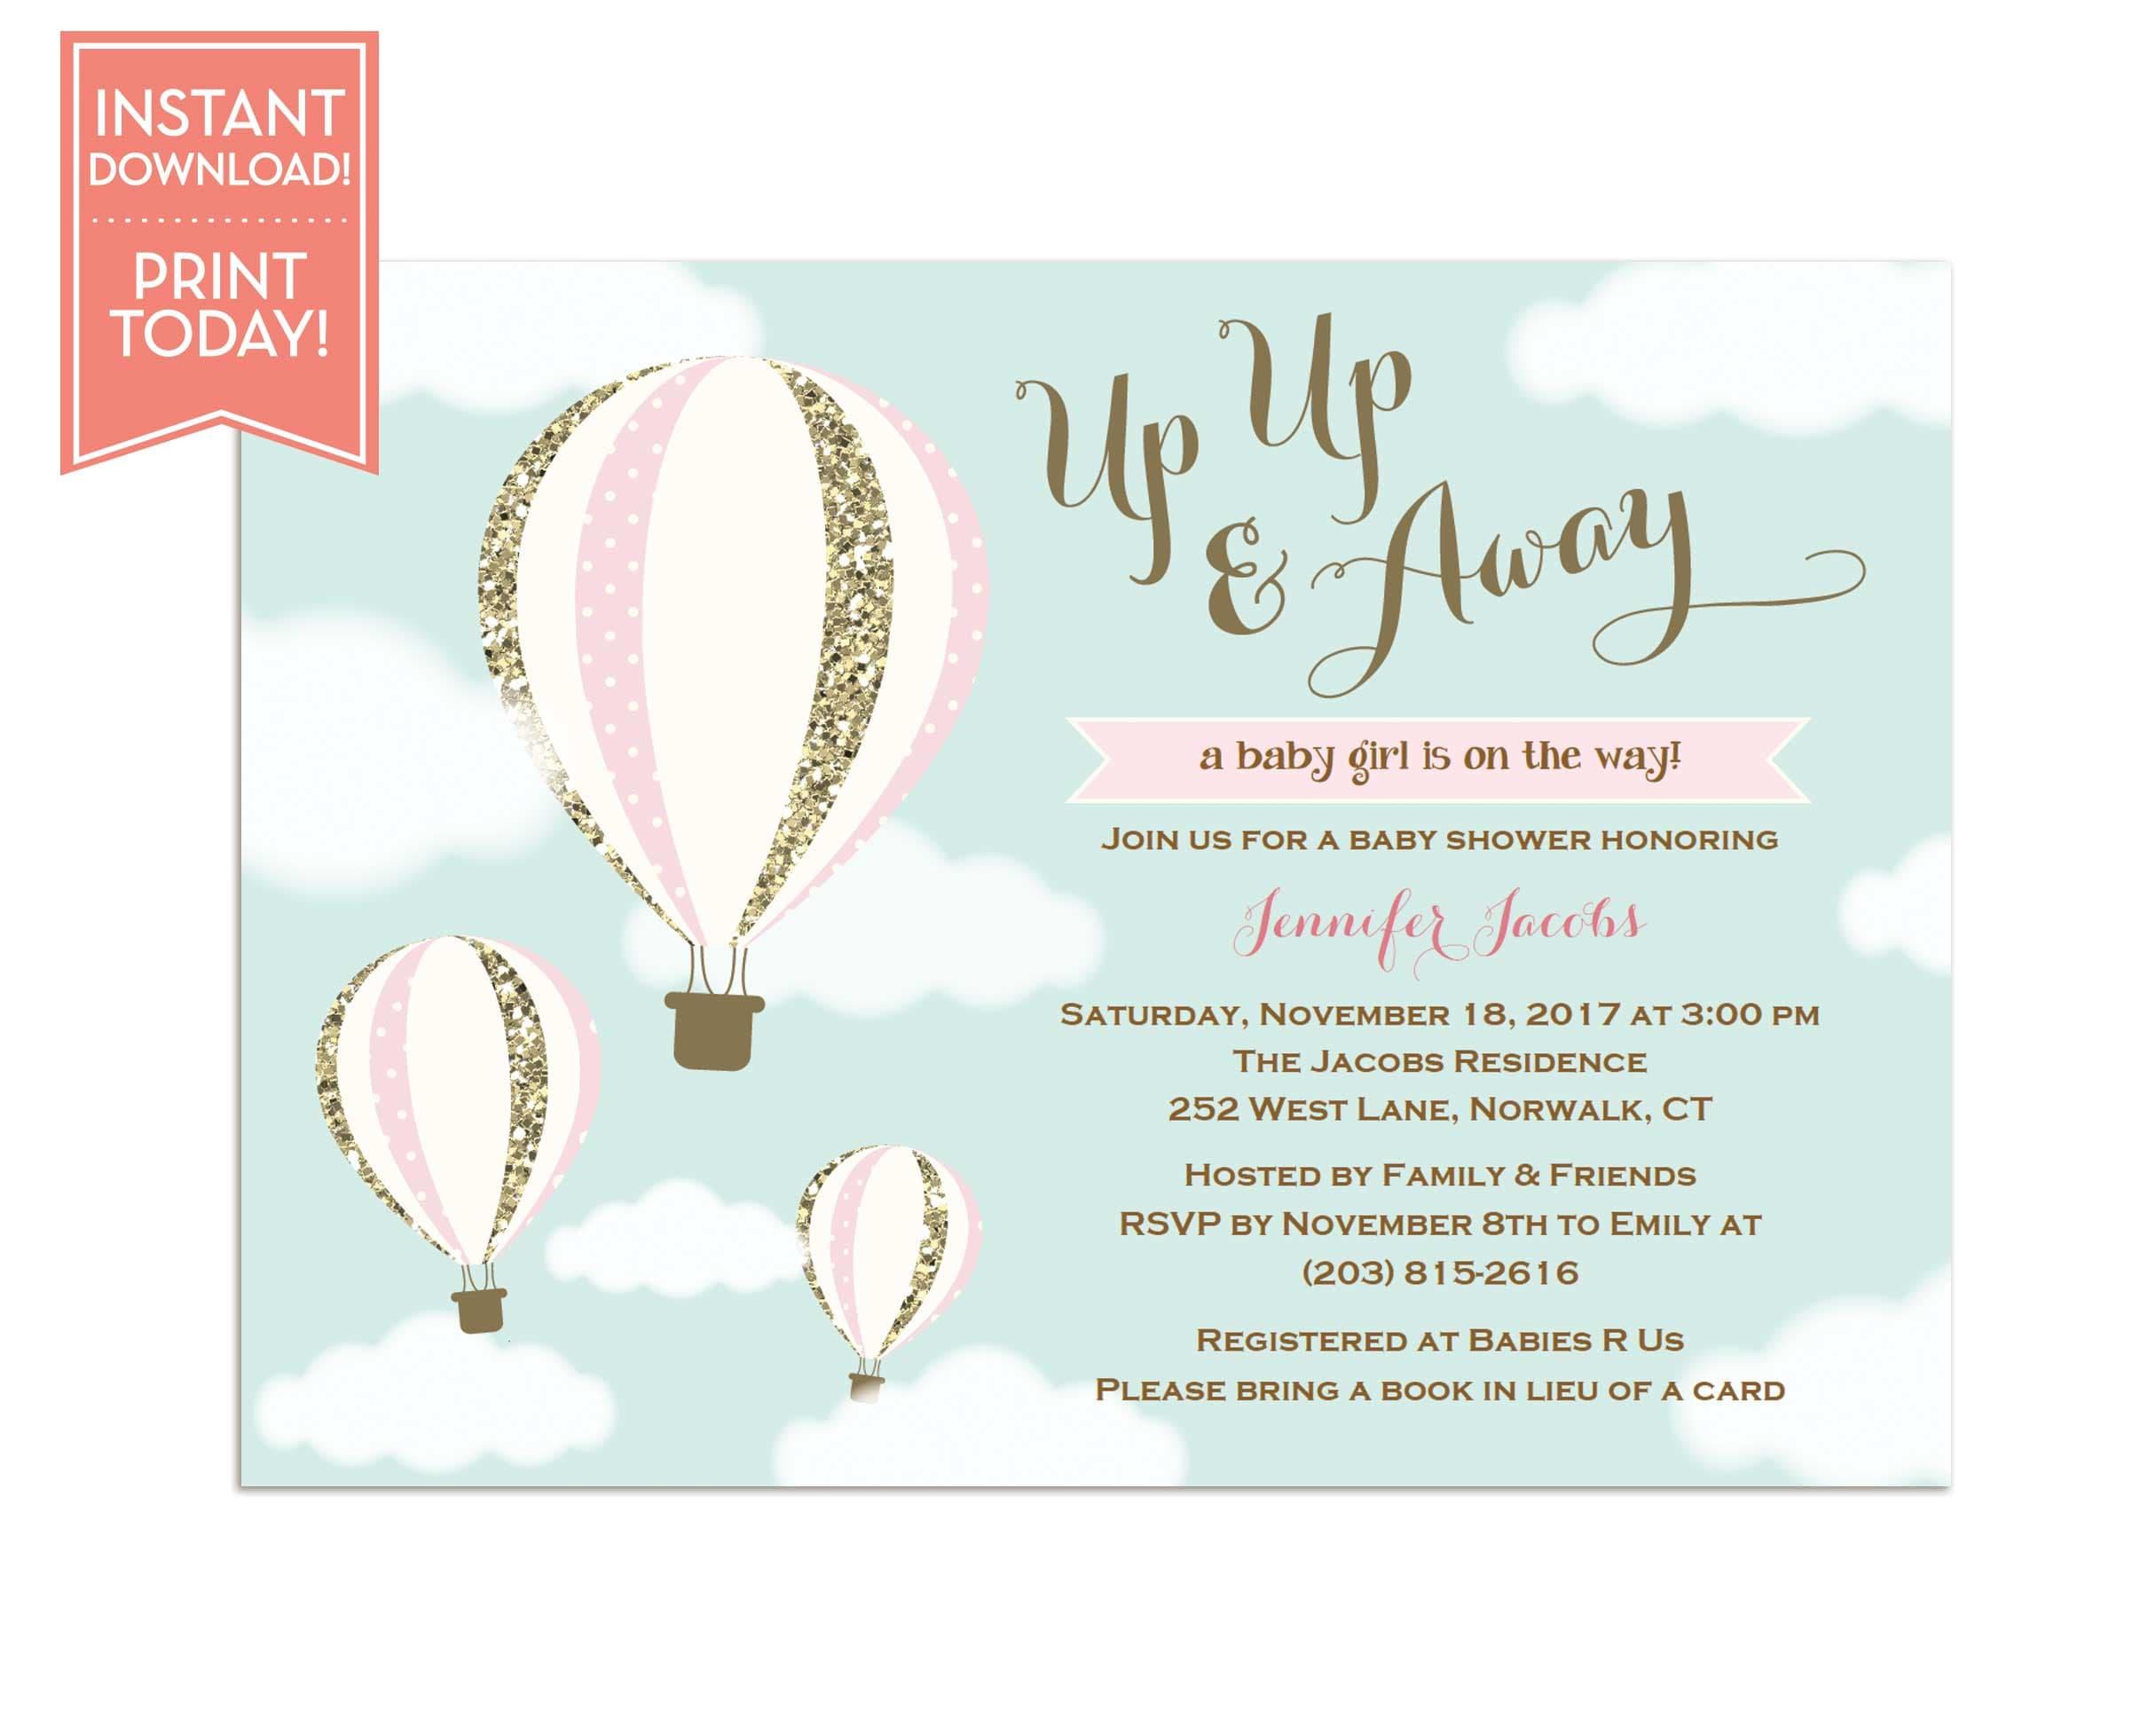 Hot Air Balloon Invitation Template Baby Shower Birthday